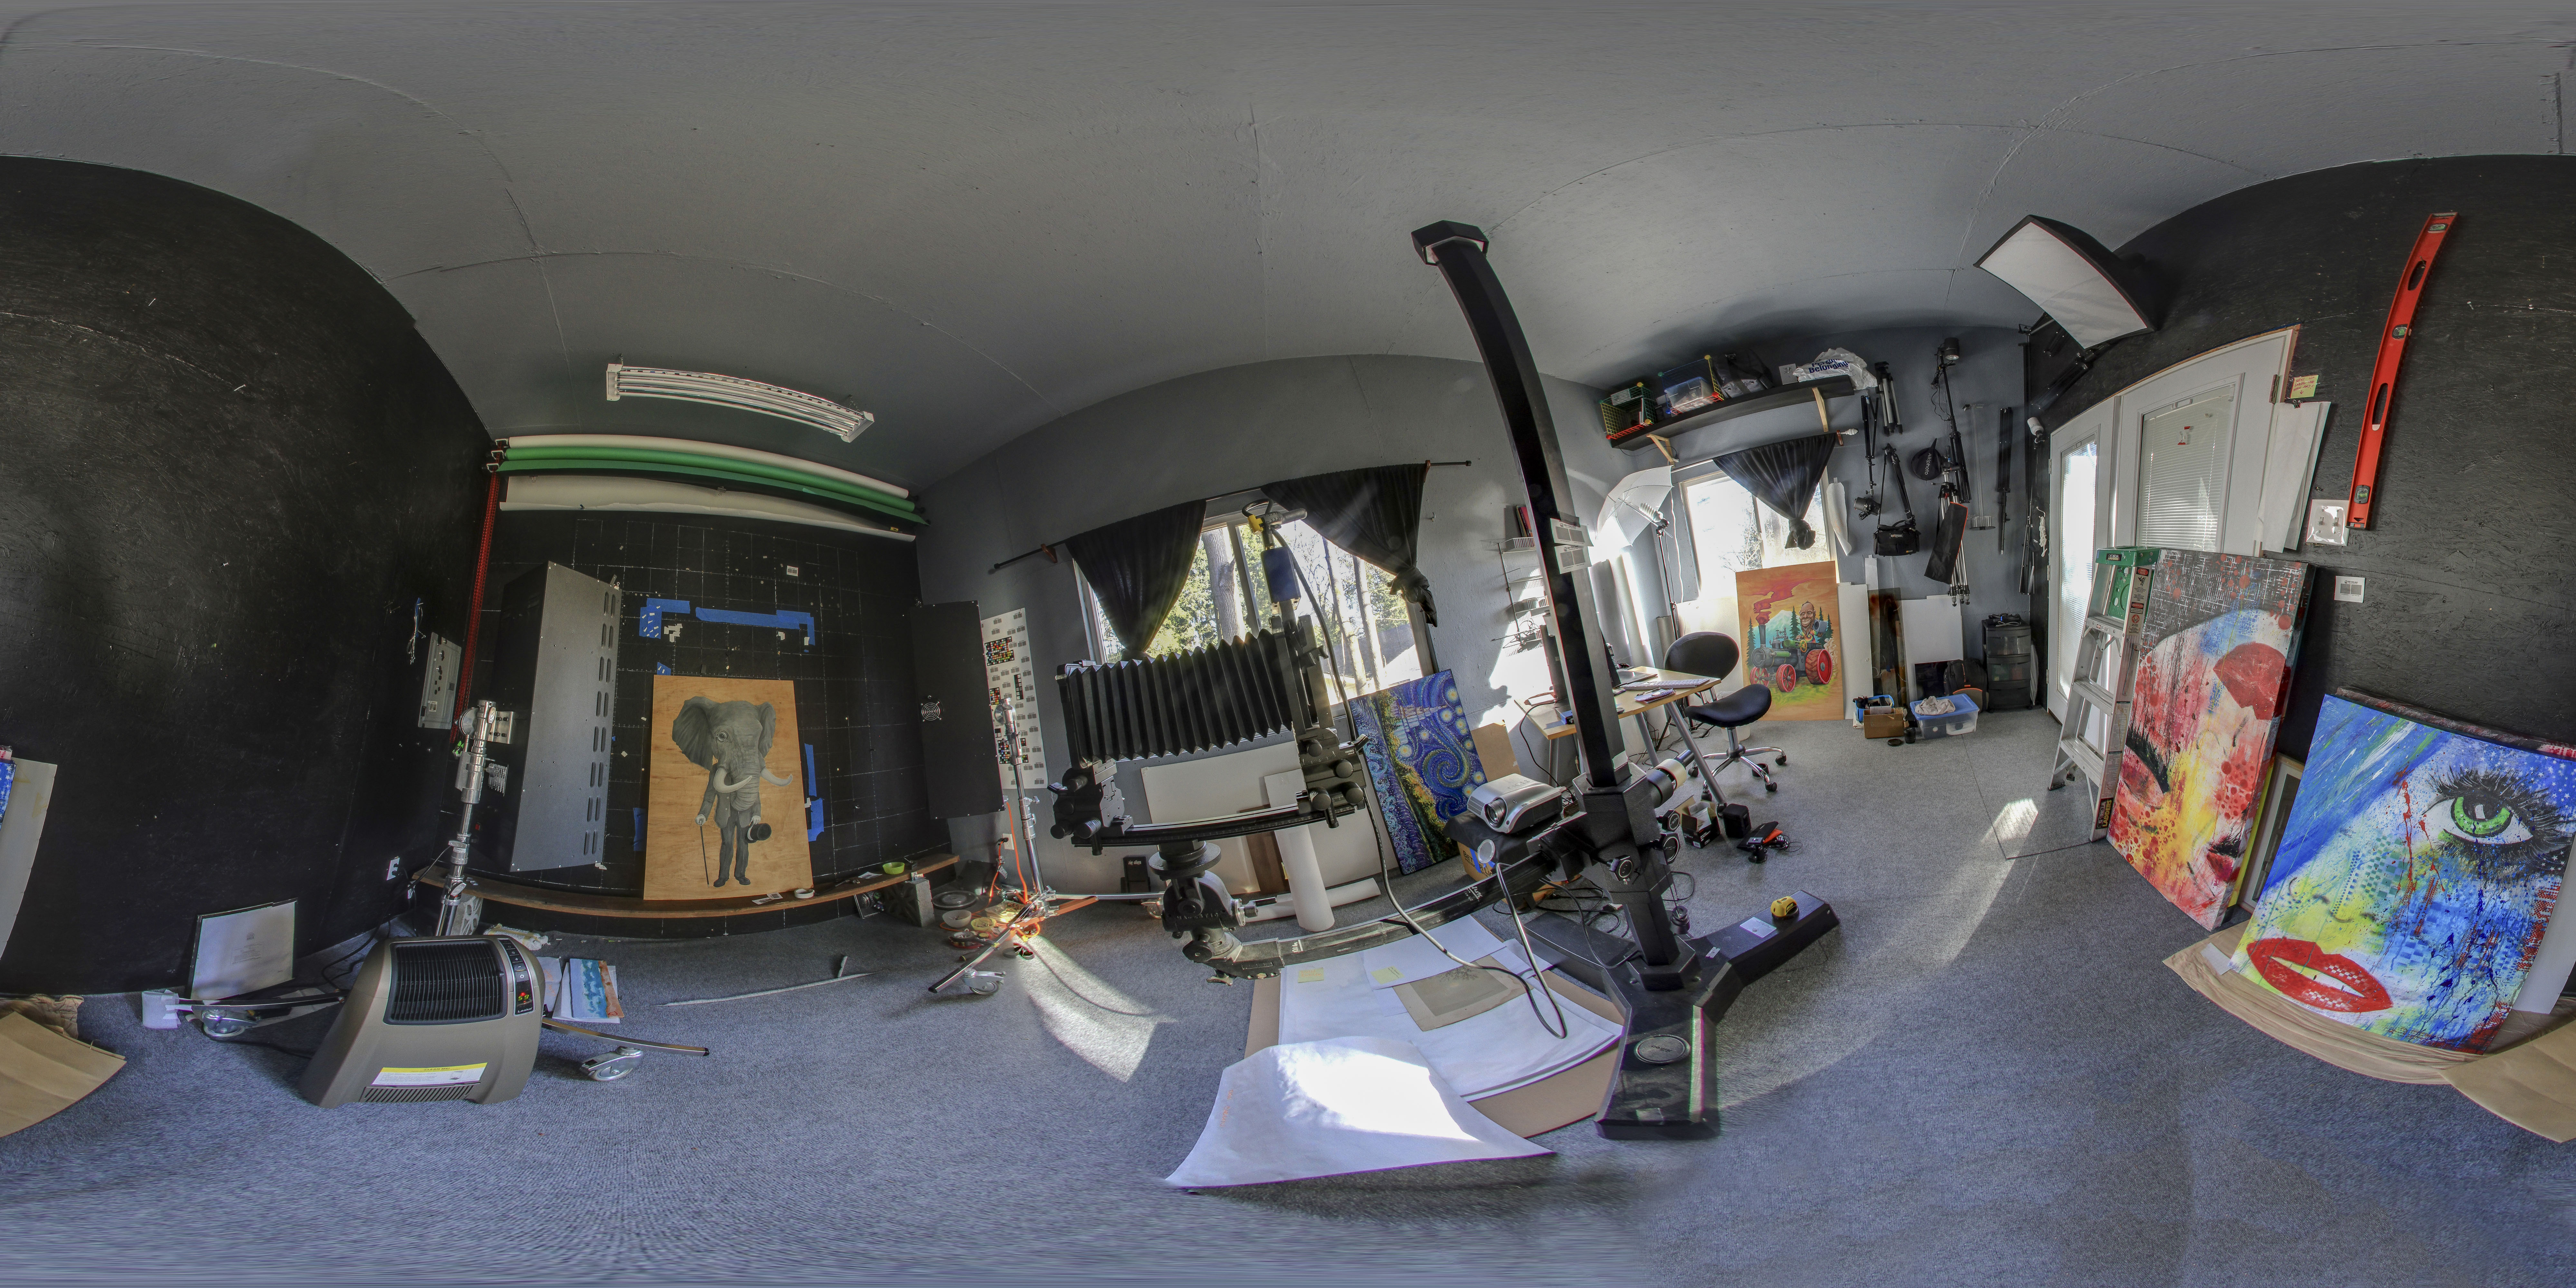 Camera Room Pano Fixed 1 8k Bellevue Fine Art